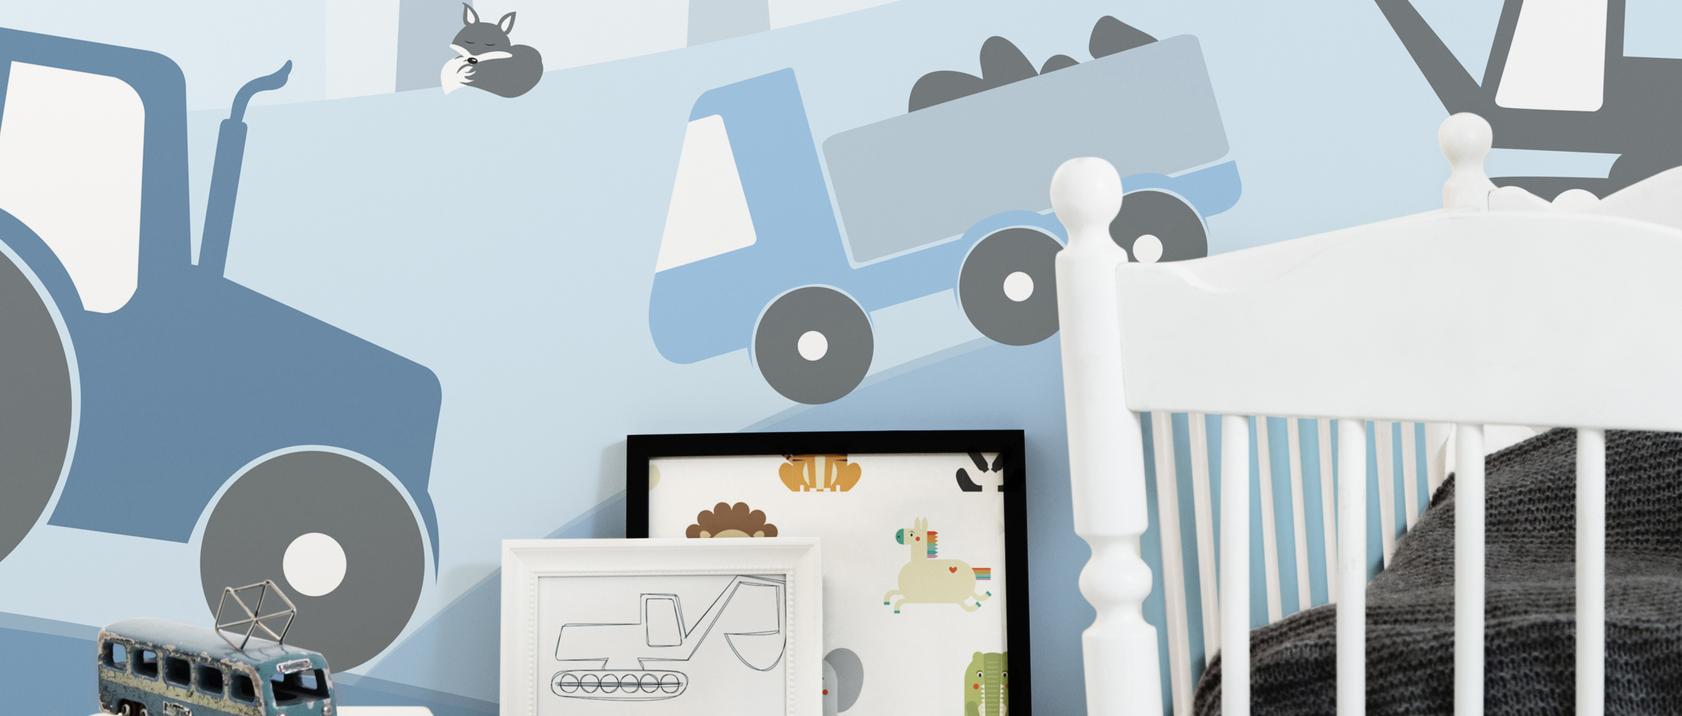 Sne design